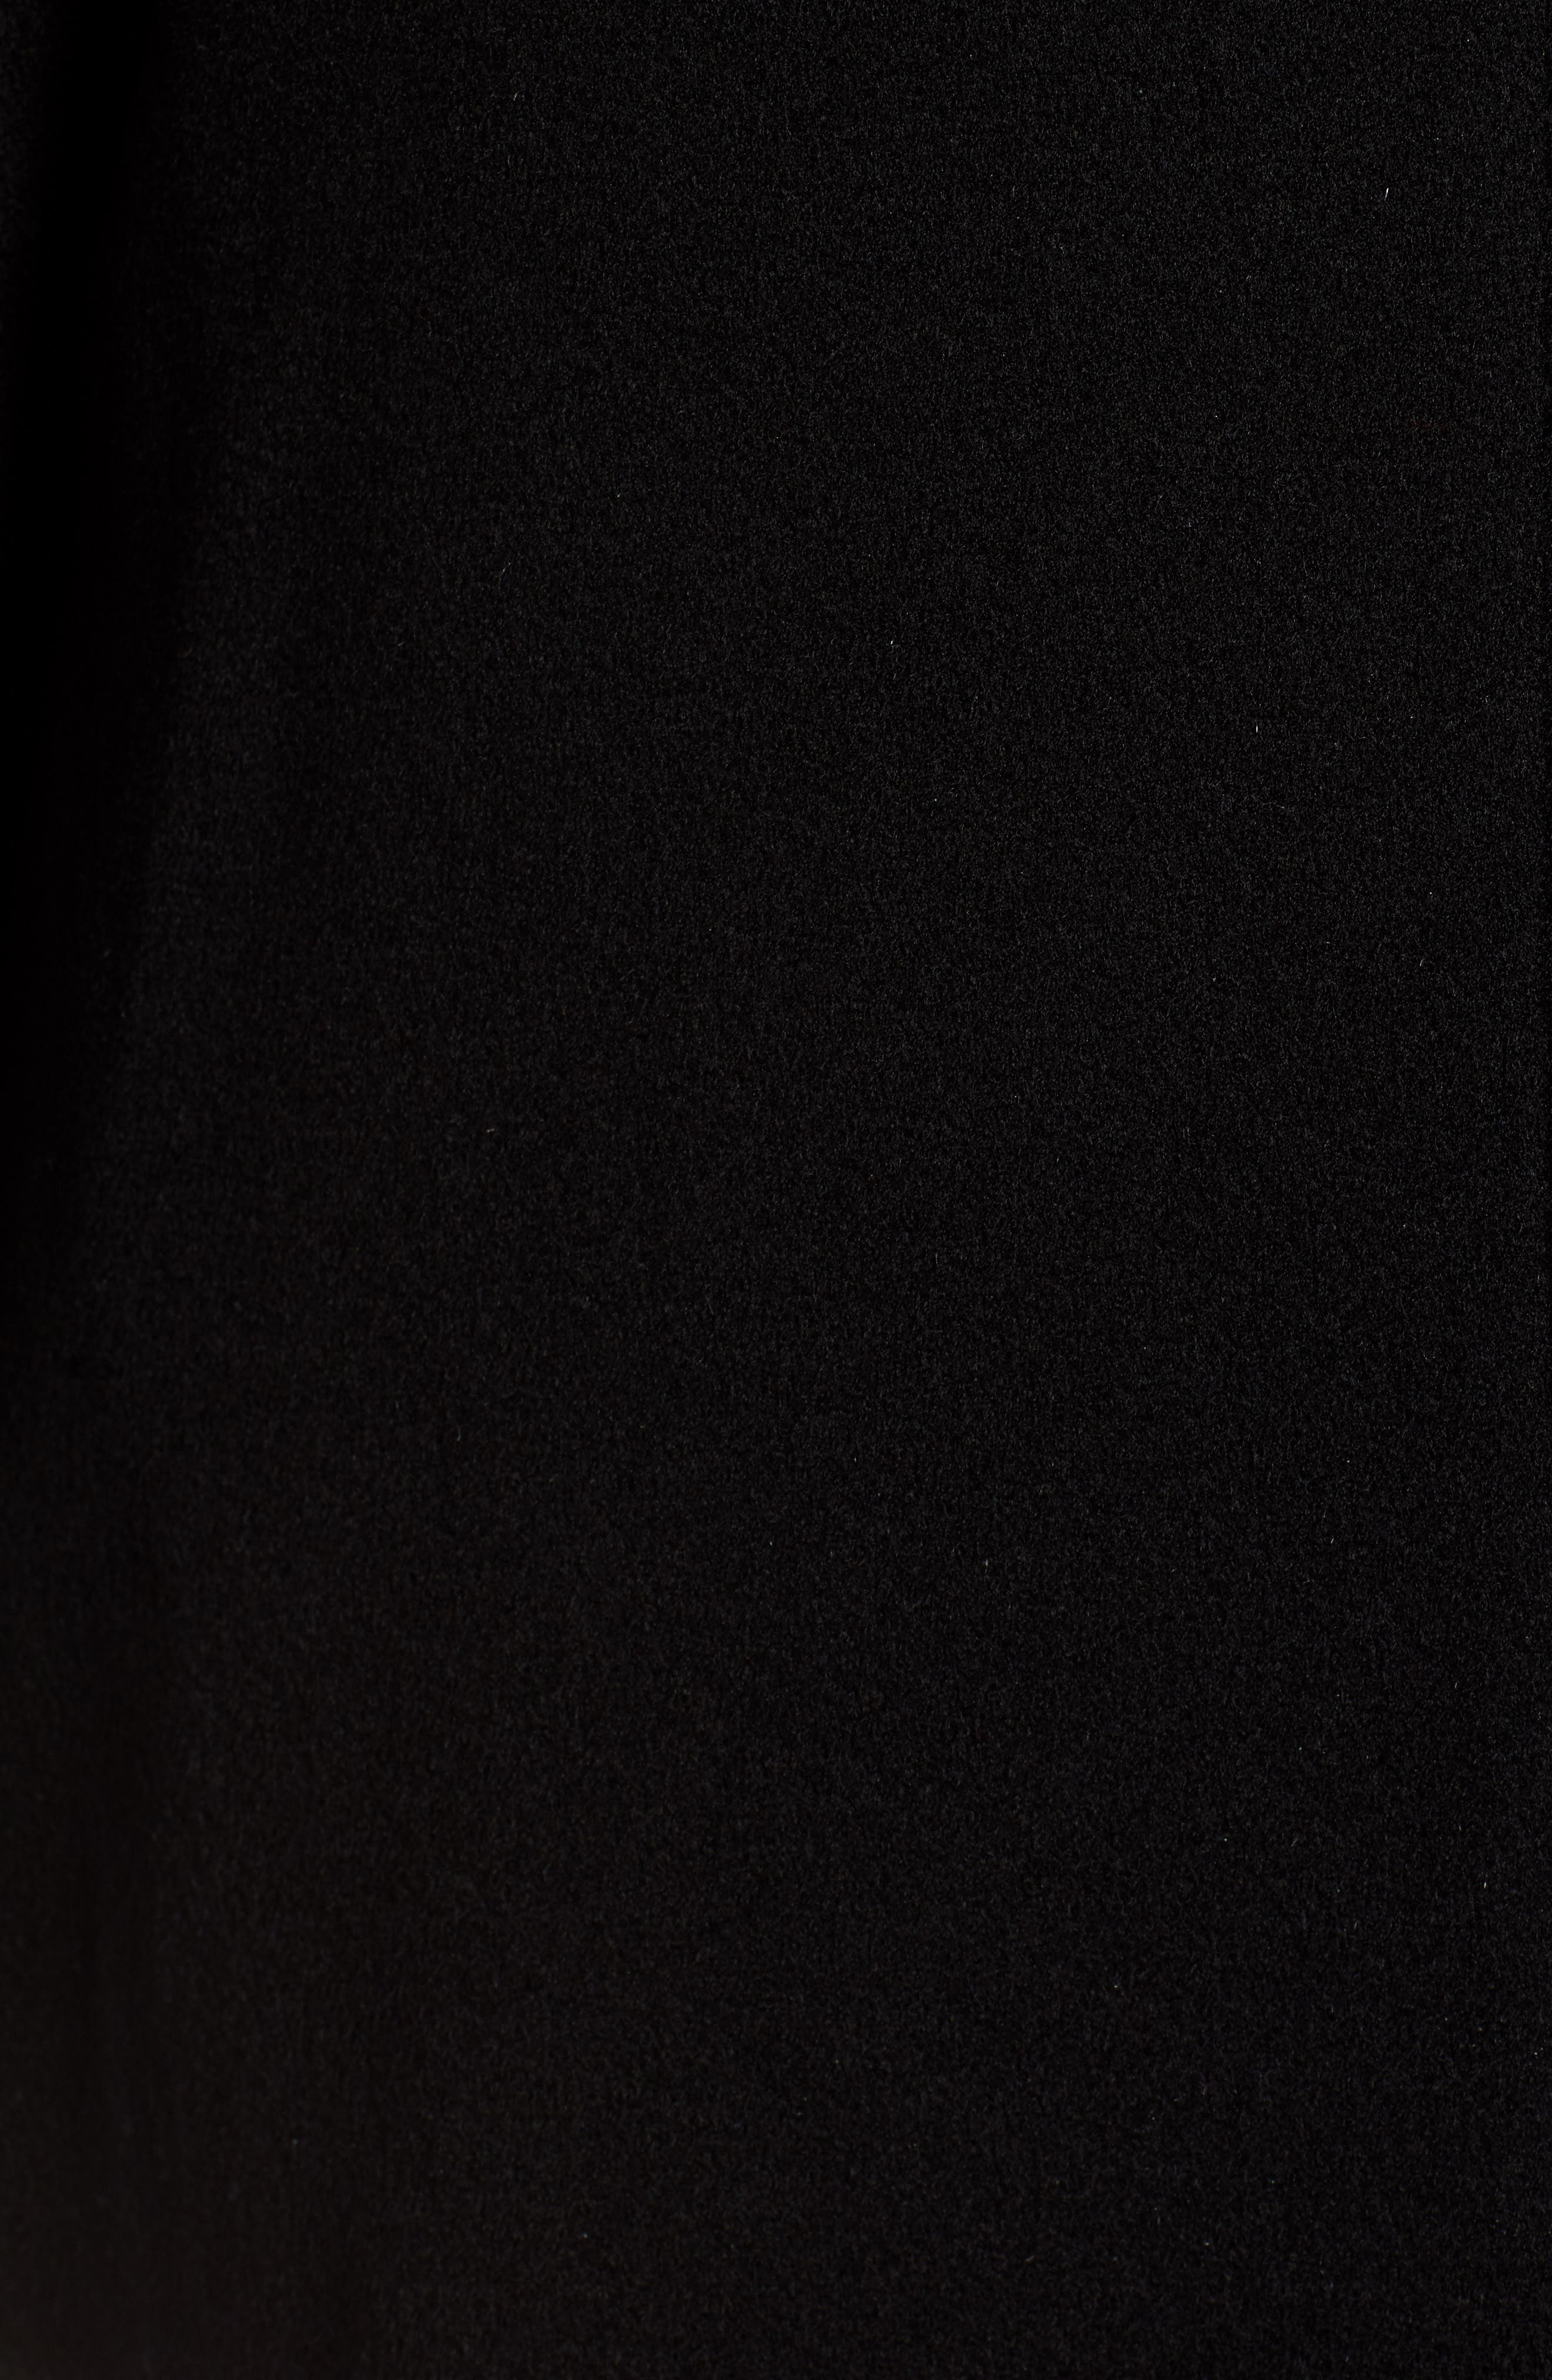 Placket Front Wool Car Coat,                             Alternate thumbnail 7, color,                             BLACK